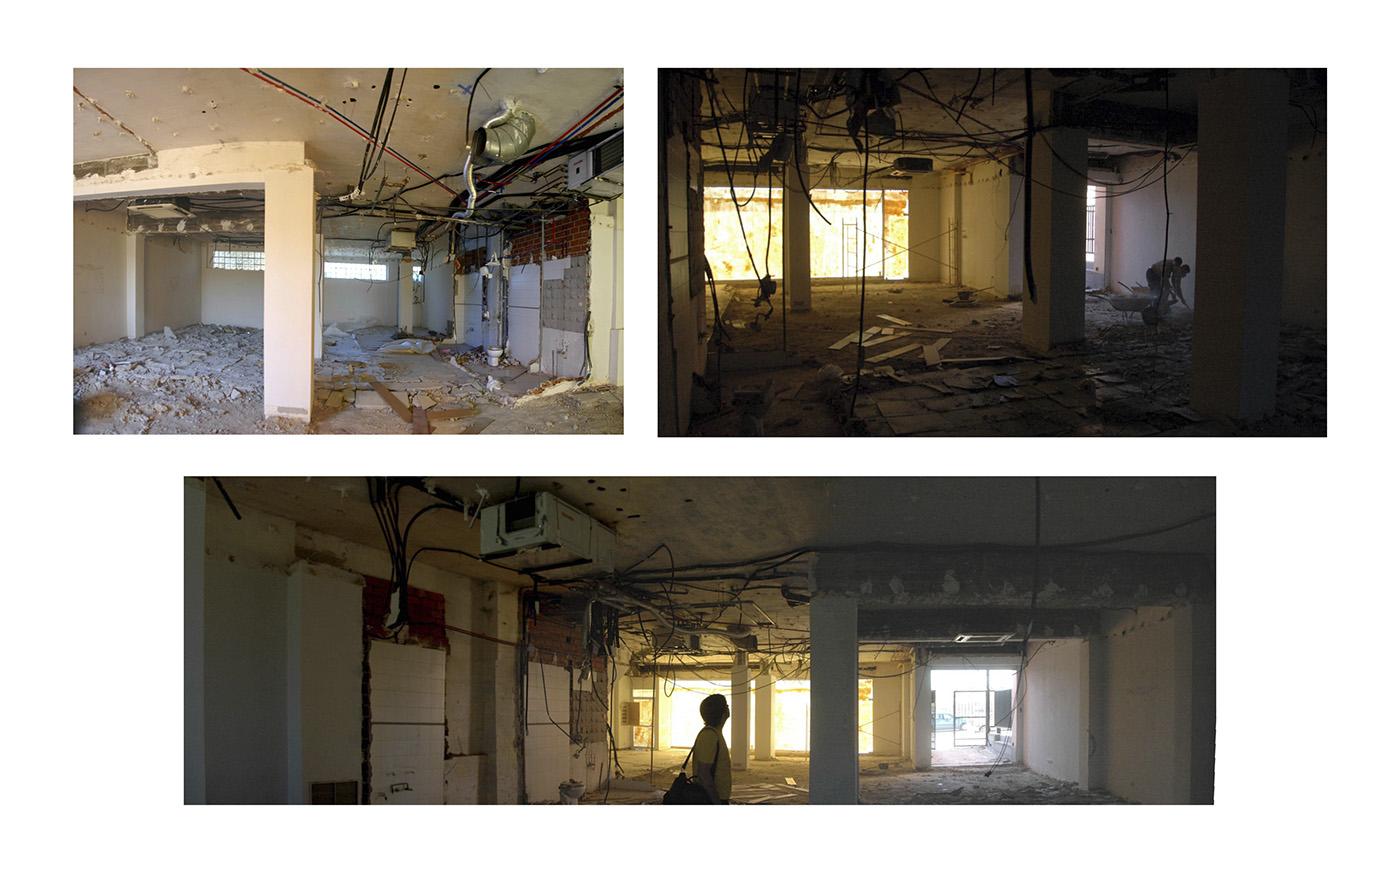 project managment cnstruction managment Site Architect childhood DCV mitai